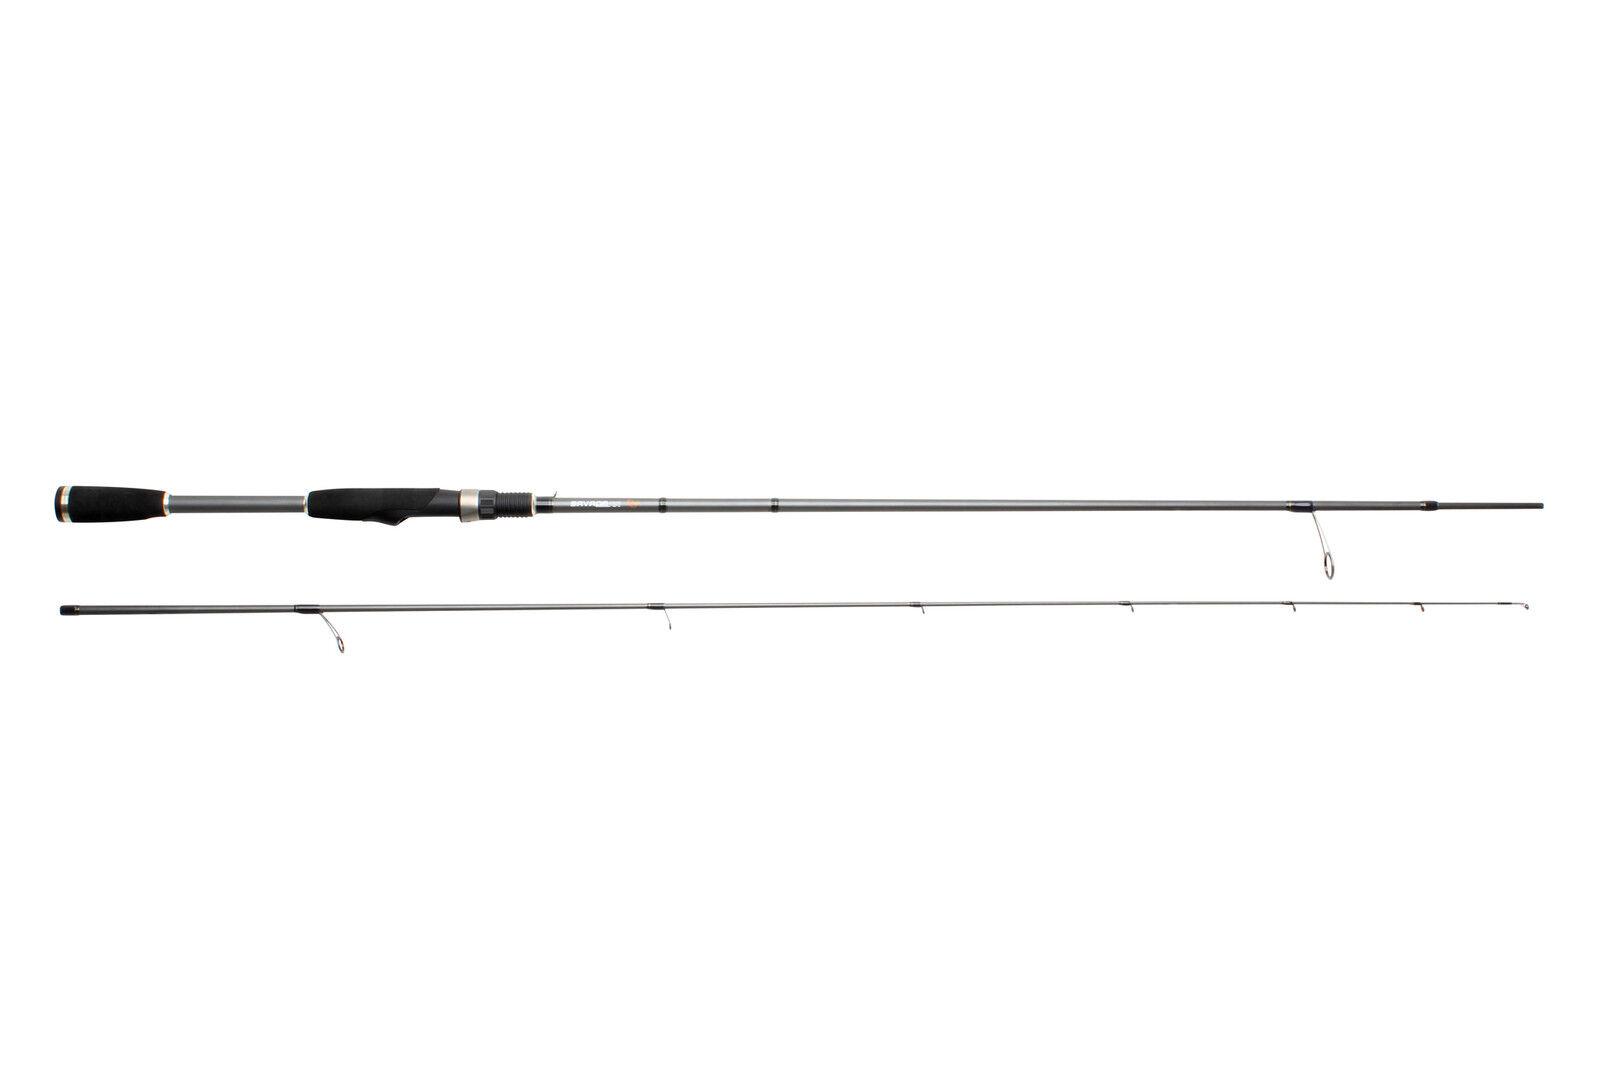 Savage Gear Finezze Softlure / 2,50m / Ultra Fast spinning rod / canne da pesca